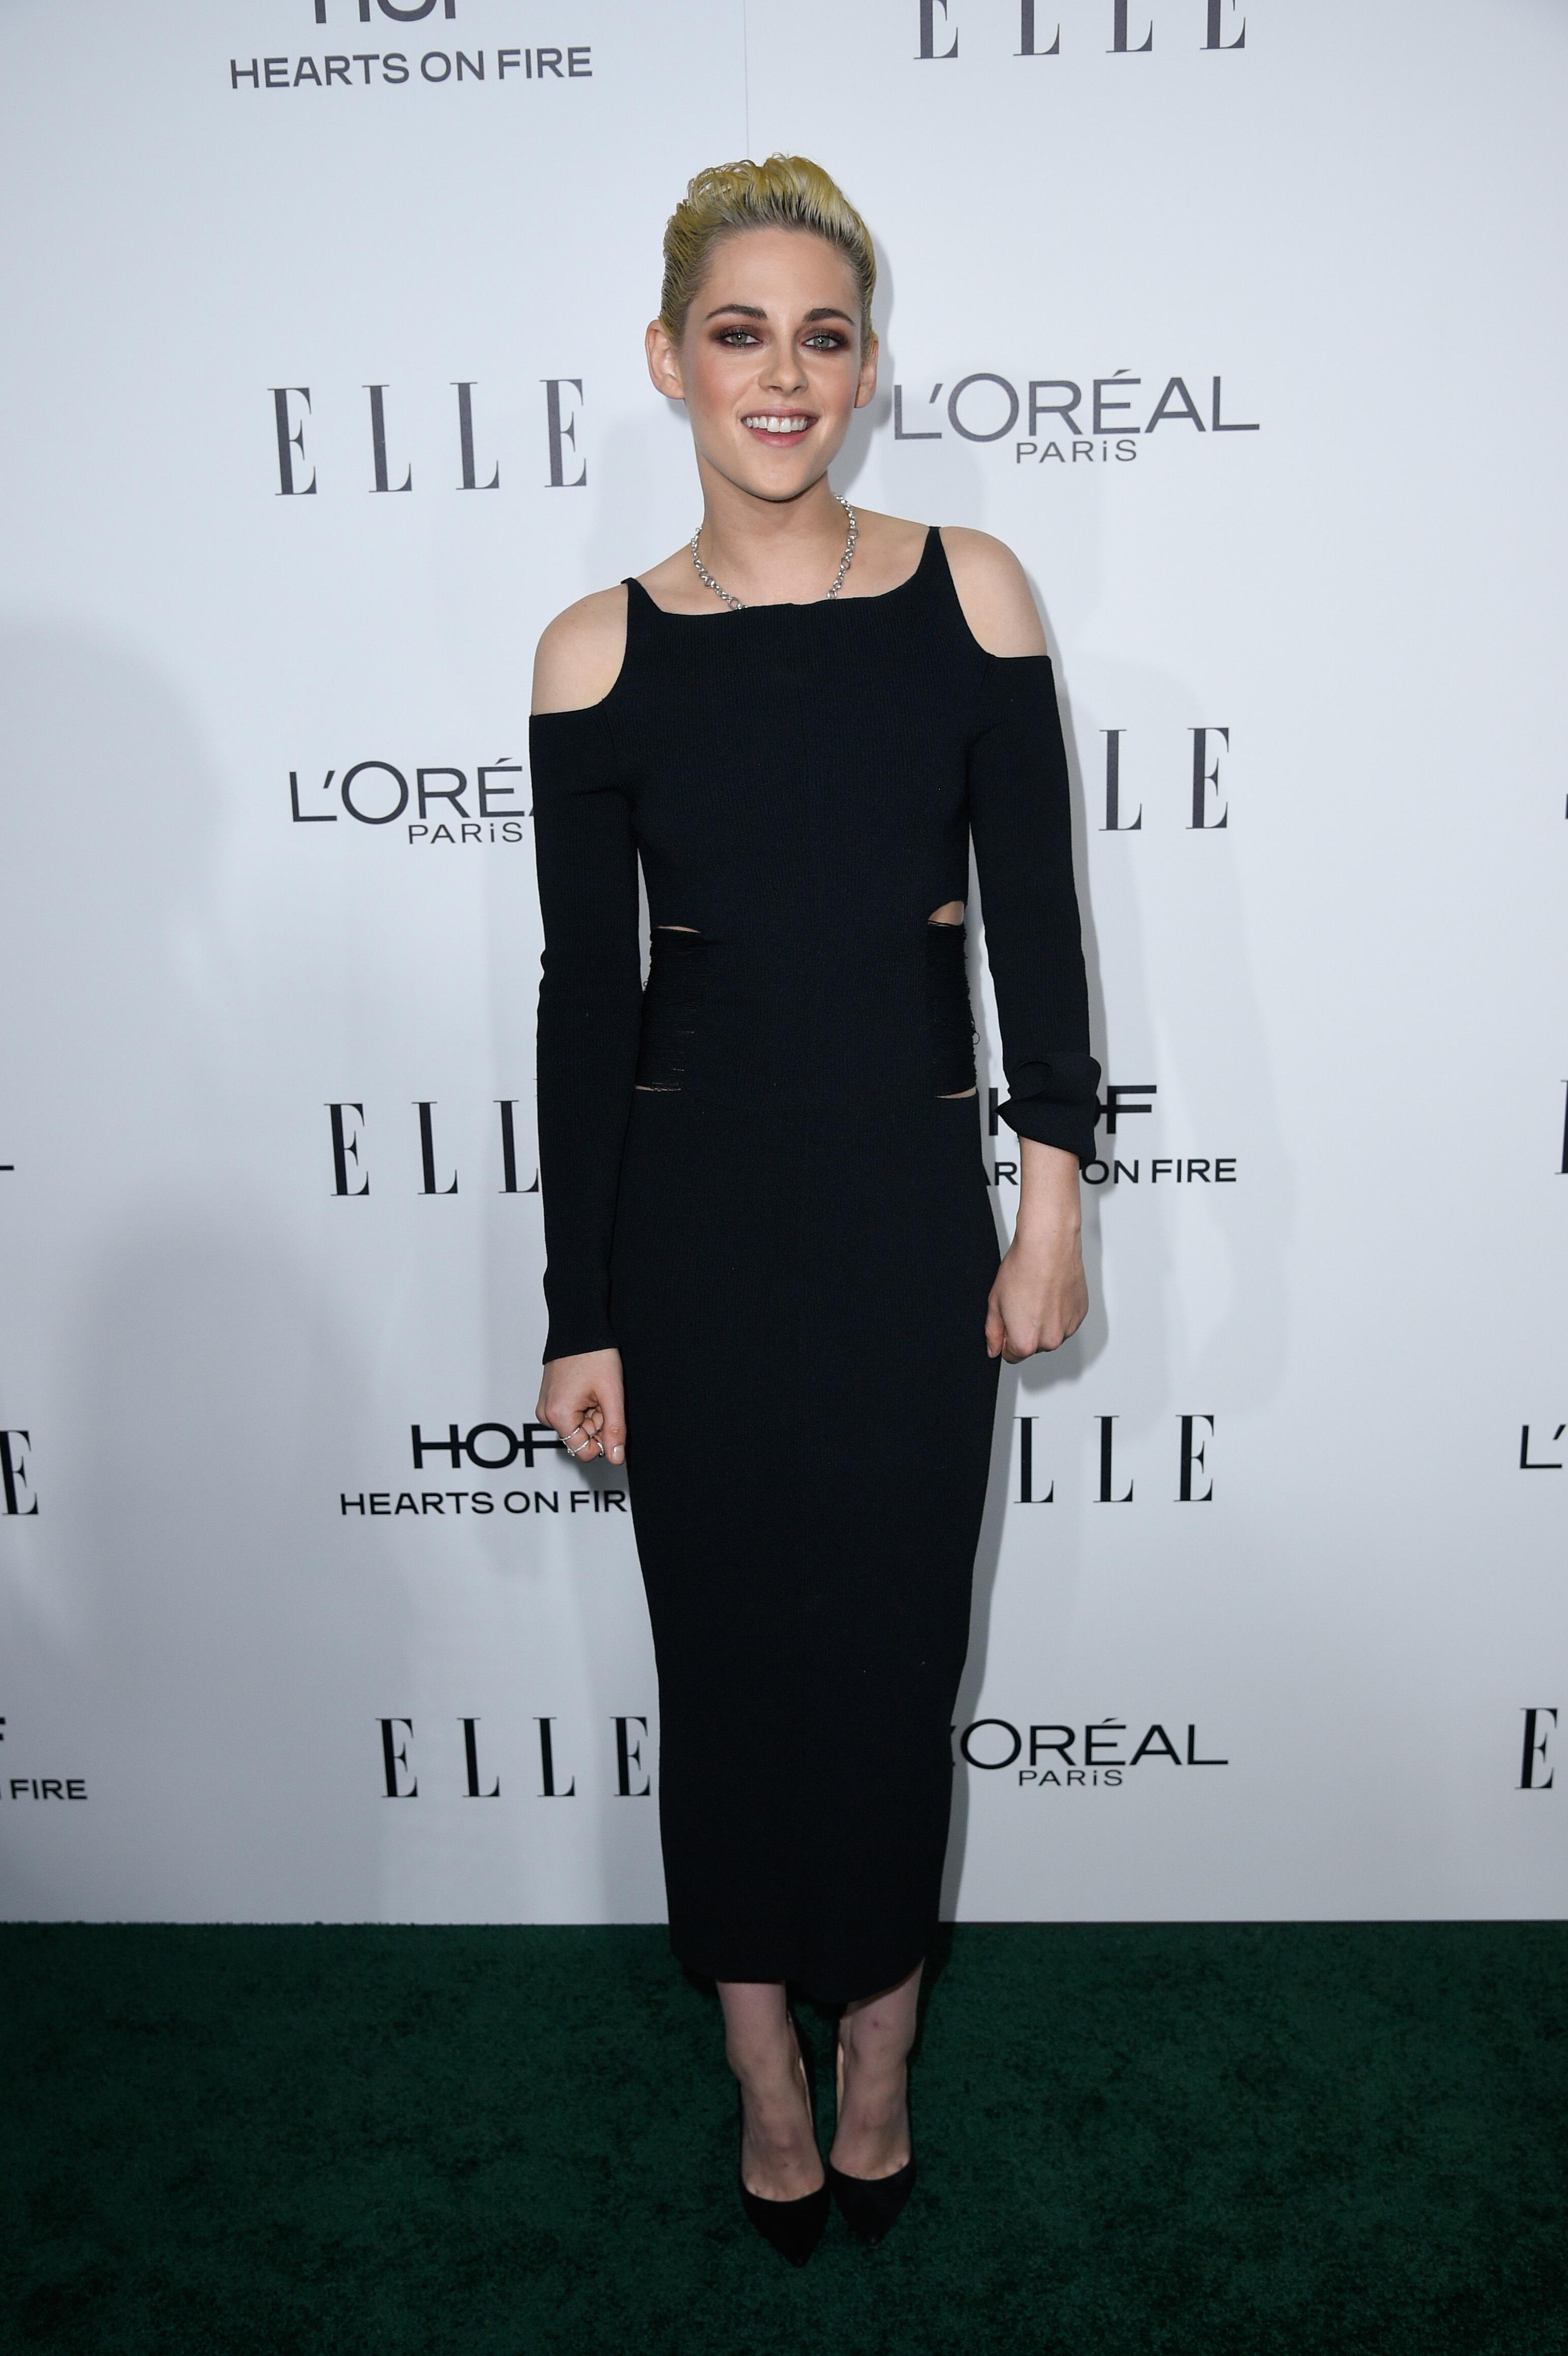 Kristen Stewart, St. Vincent enjoy a date night at Elle Awards